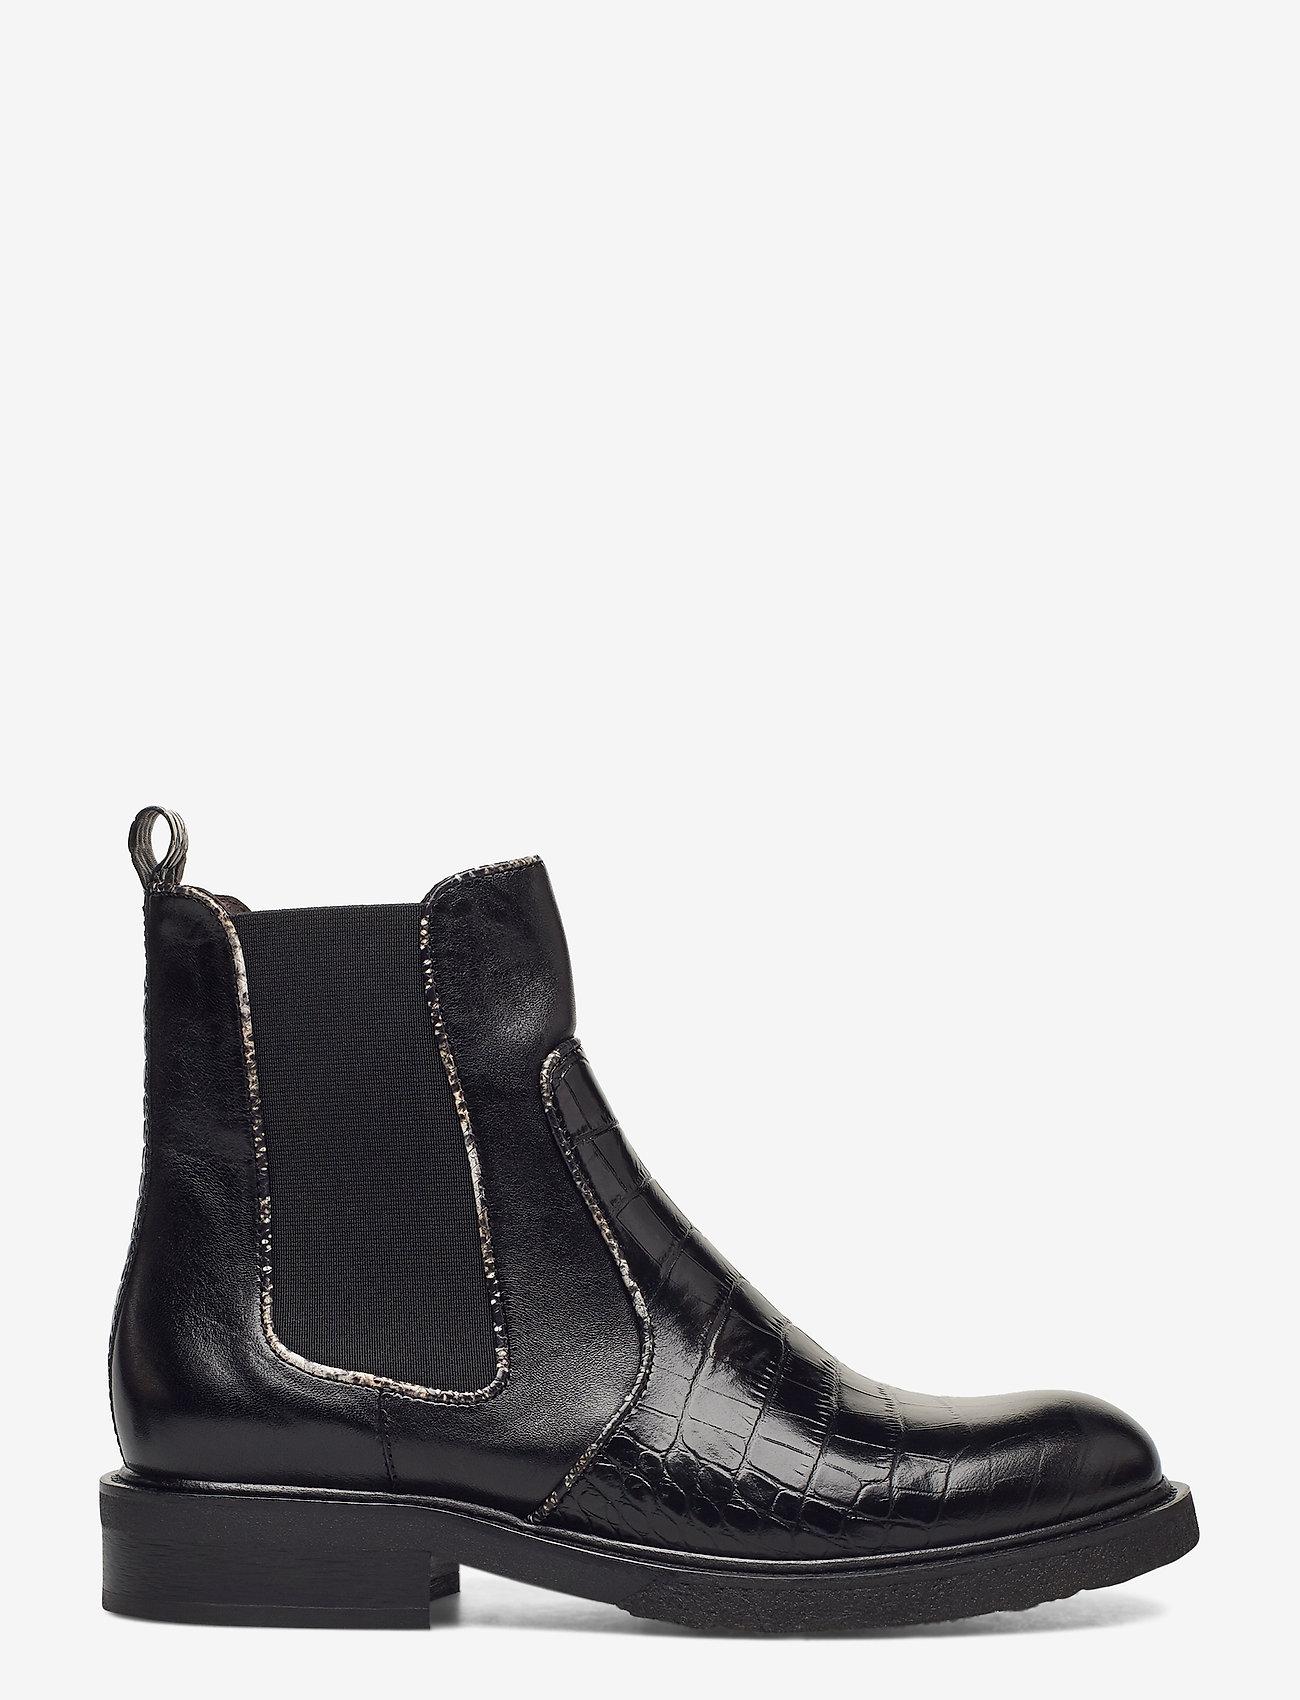 Billi Bi - Boots 4759 - chelsea boots - black luisiana croco/bolik 010 - 1